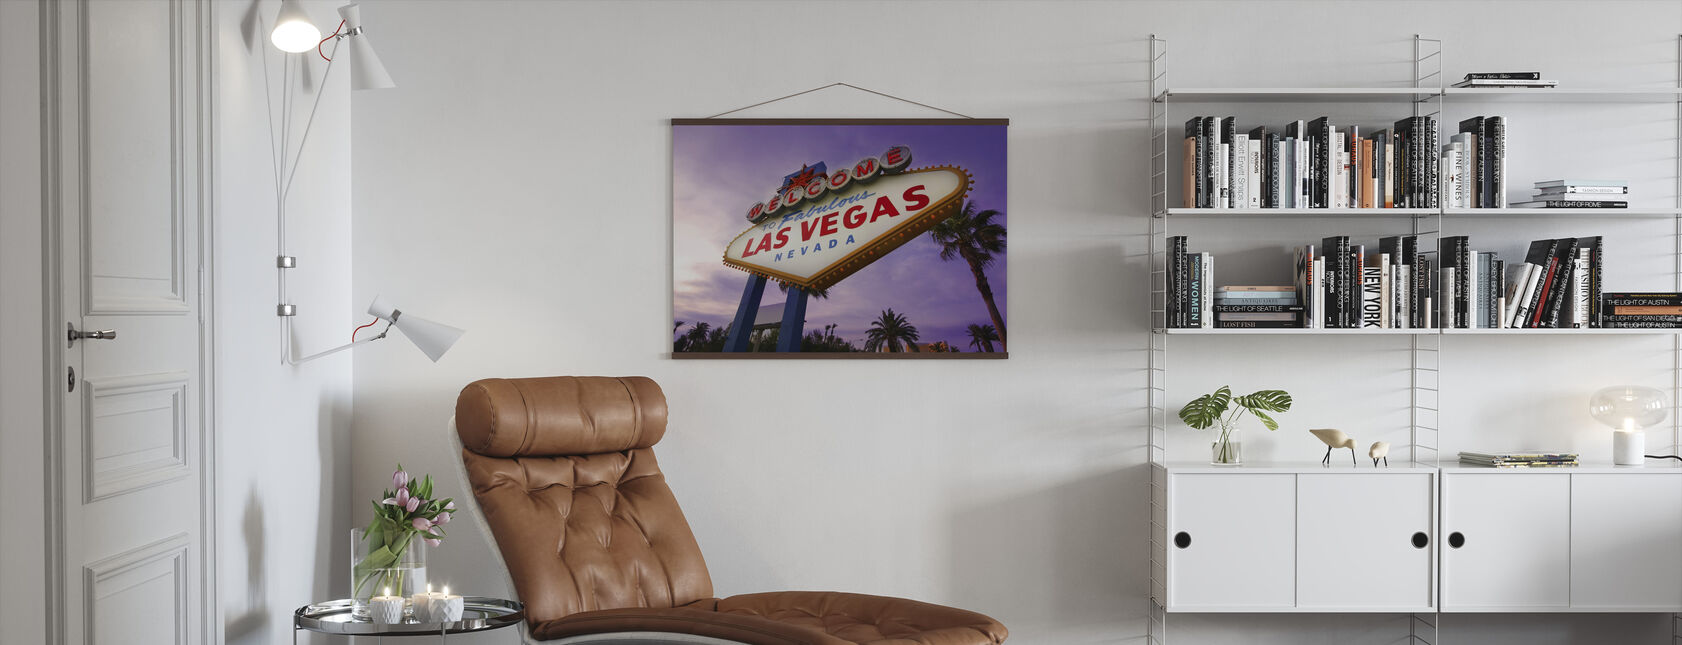 Las Vegas Sign - Poster - Living Room